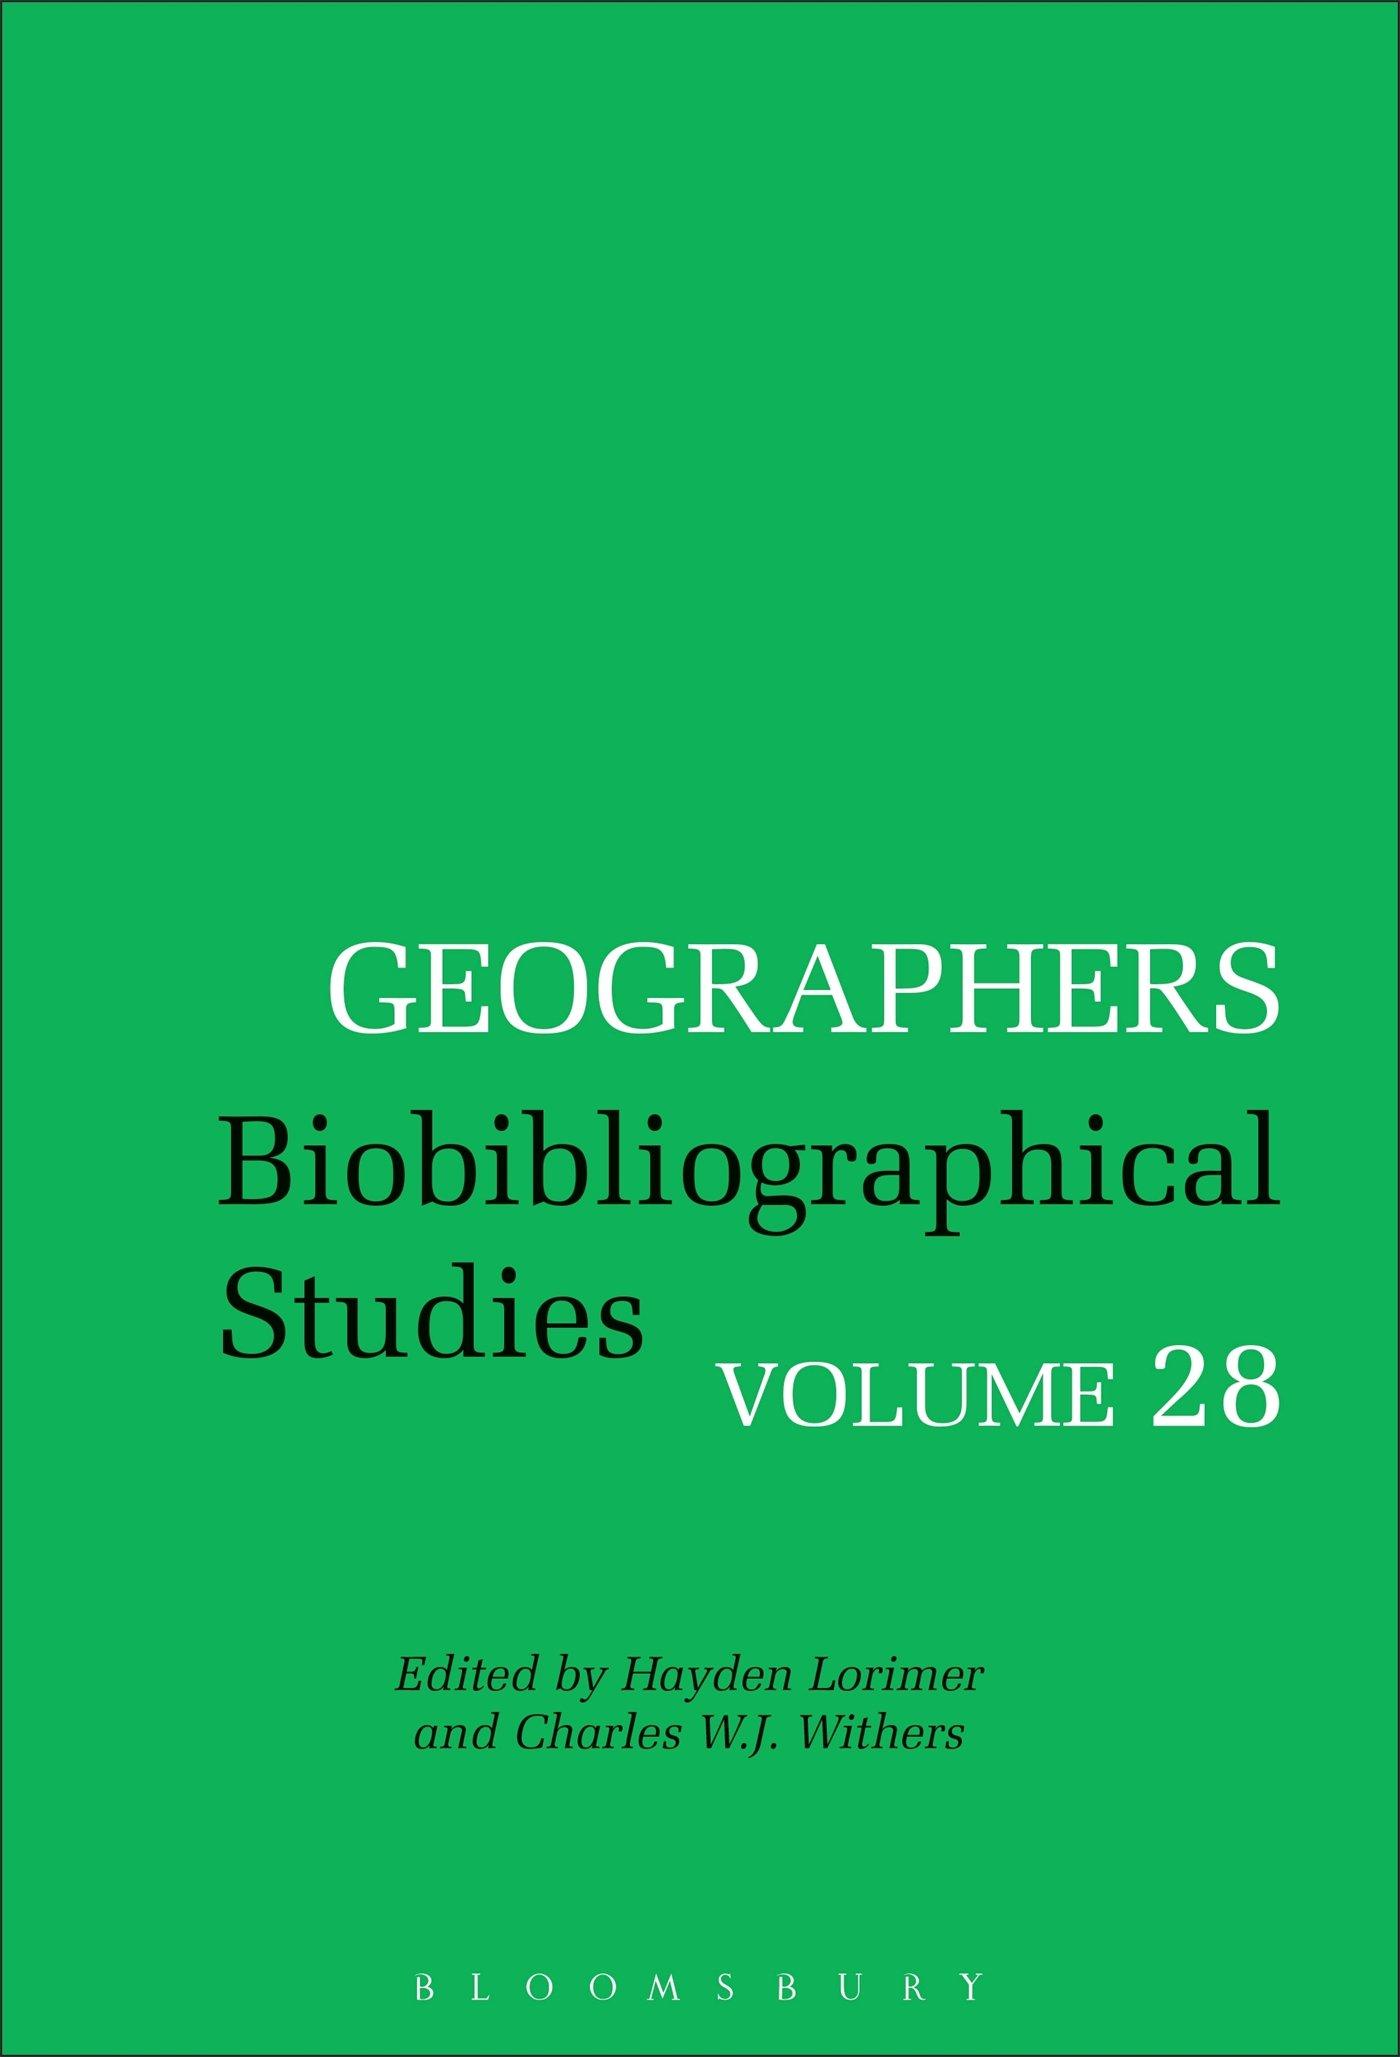 Geographers Volume 28: Biobibliographical Studies, Volume 28 by Brand: Bloomsbury Academic